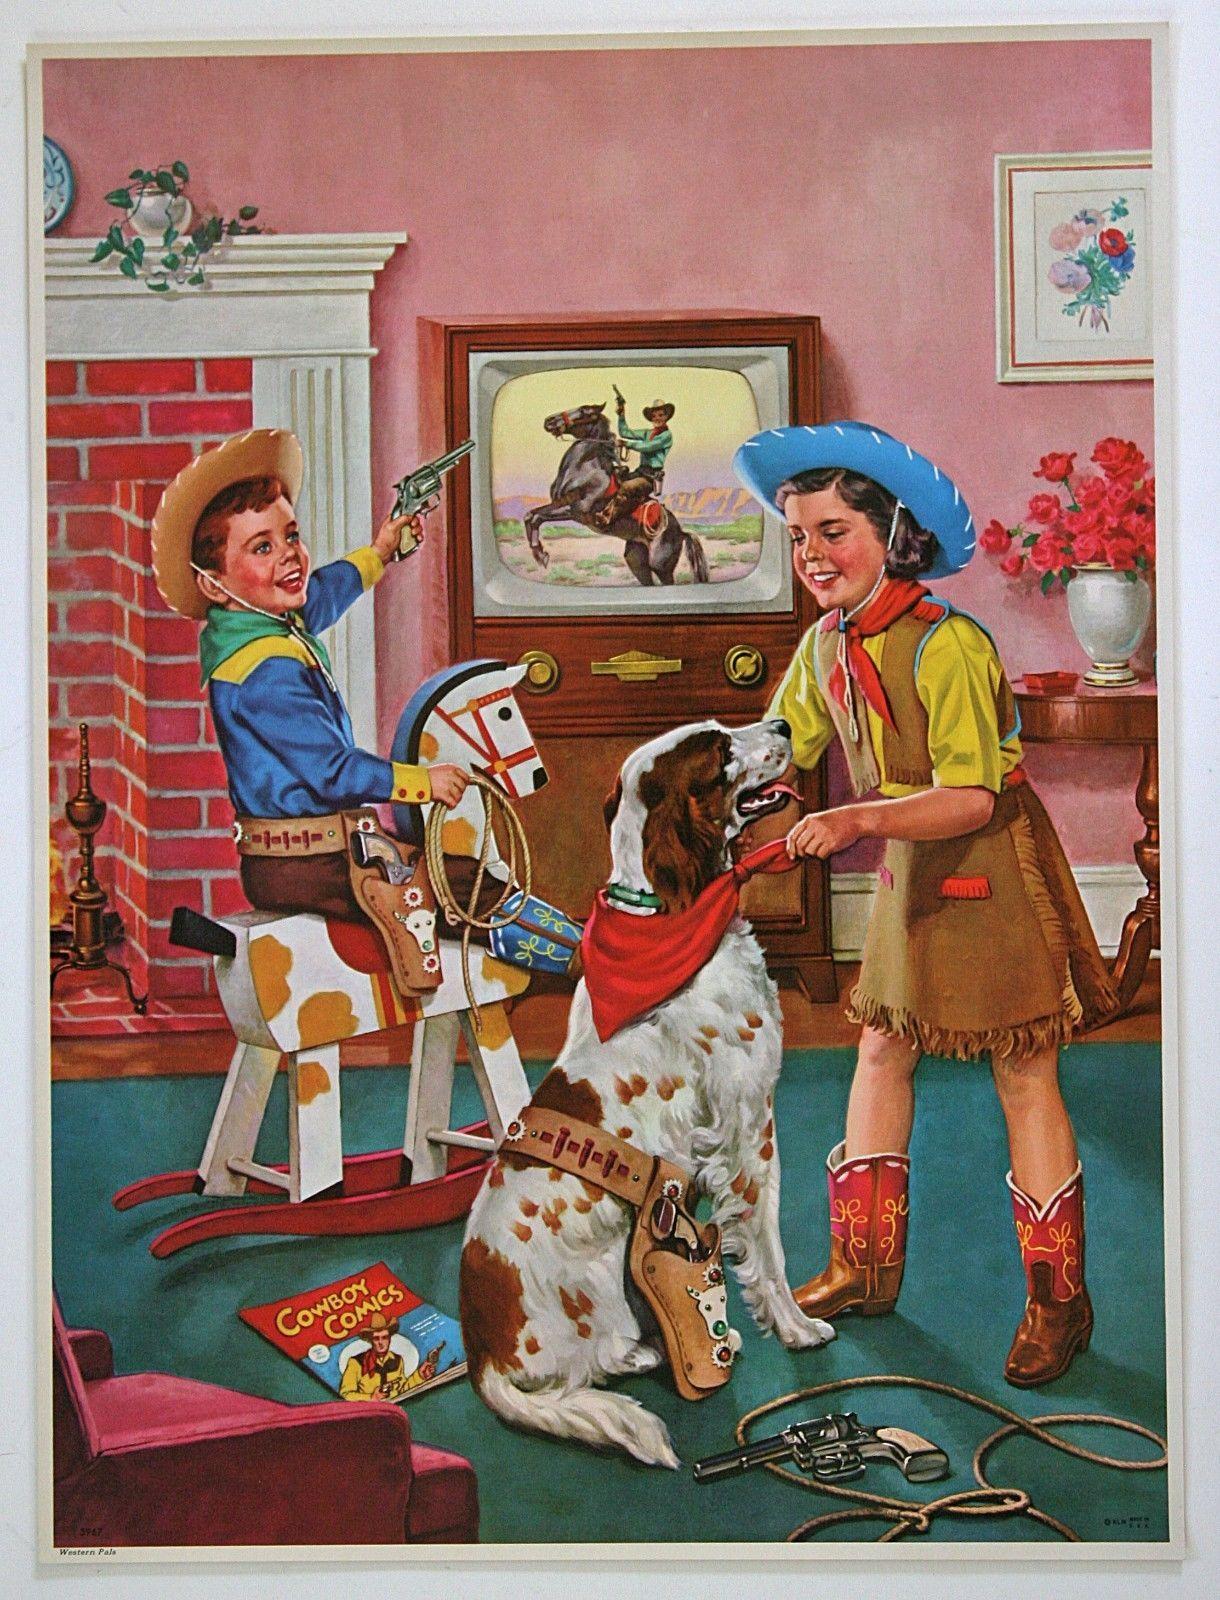 Really Big Vintage 1950s Calendar Art Print L'IL Cowboy